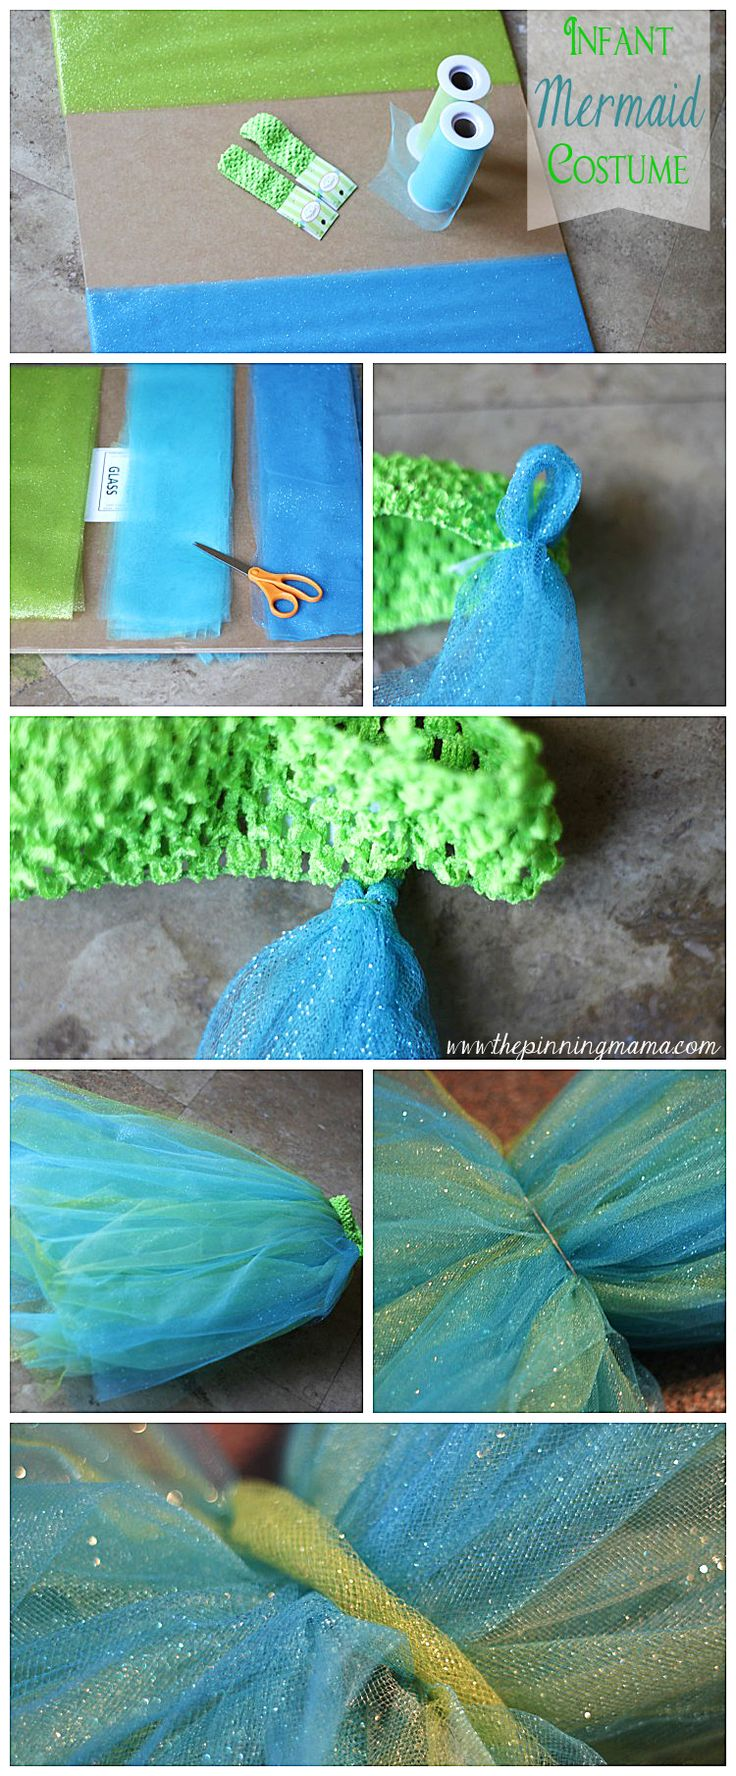 DIY Infant Mermaid Halloween Costume   The Pinning Mama